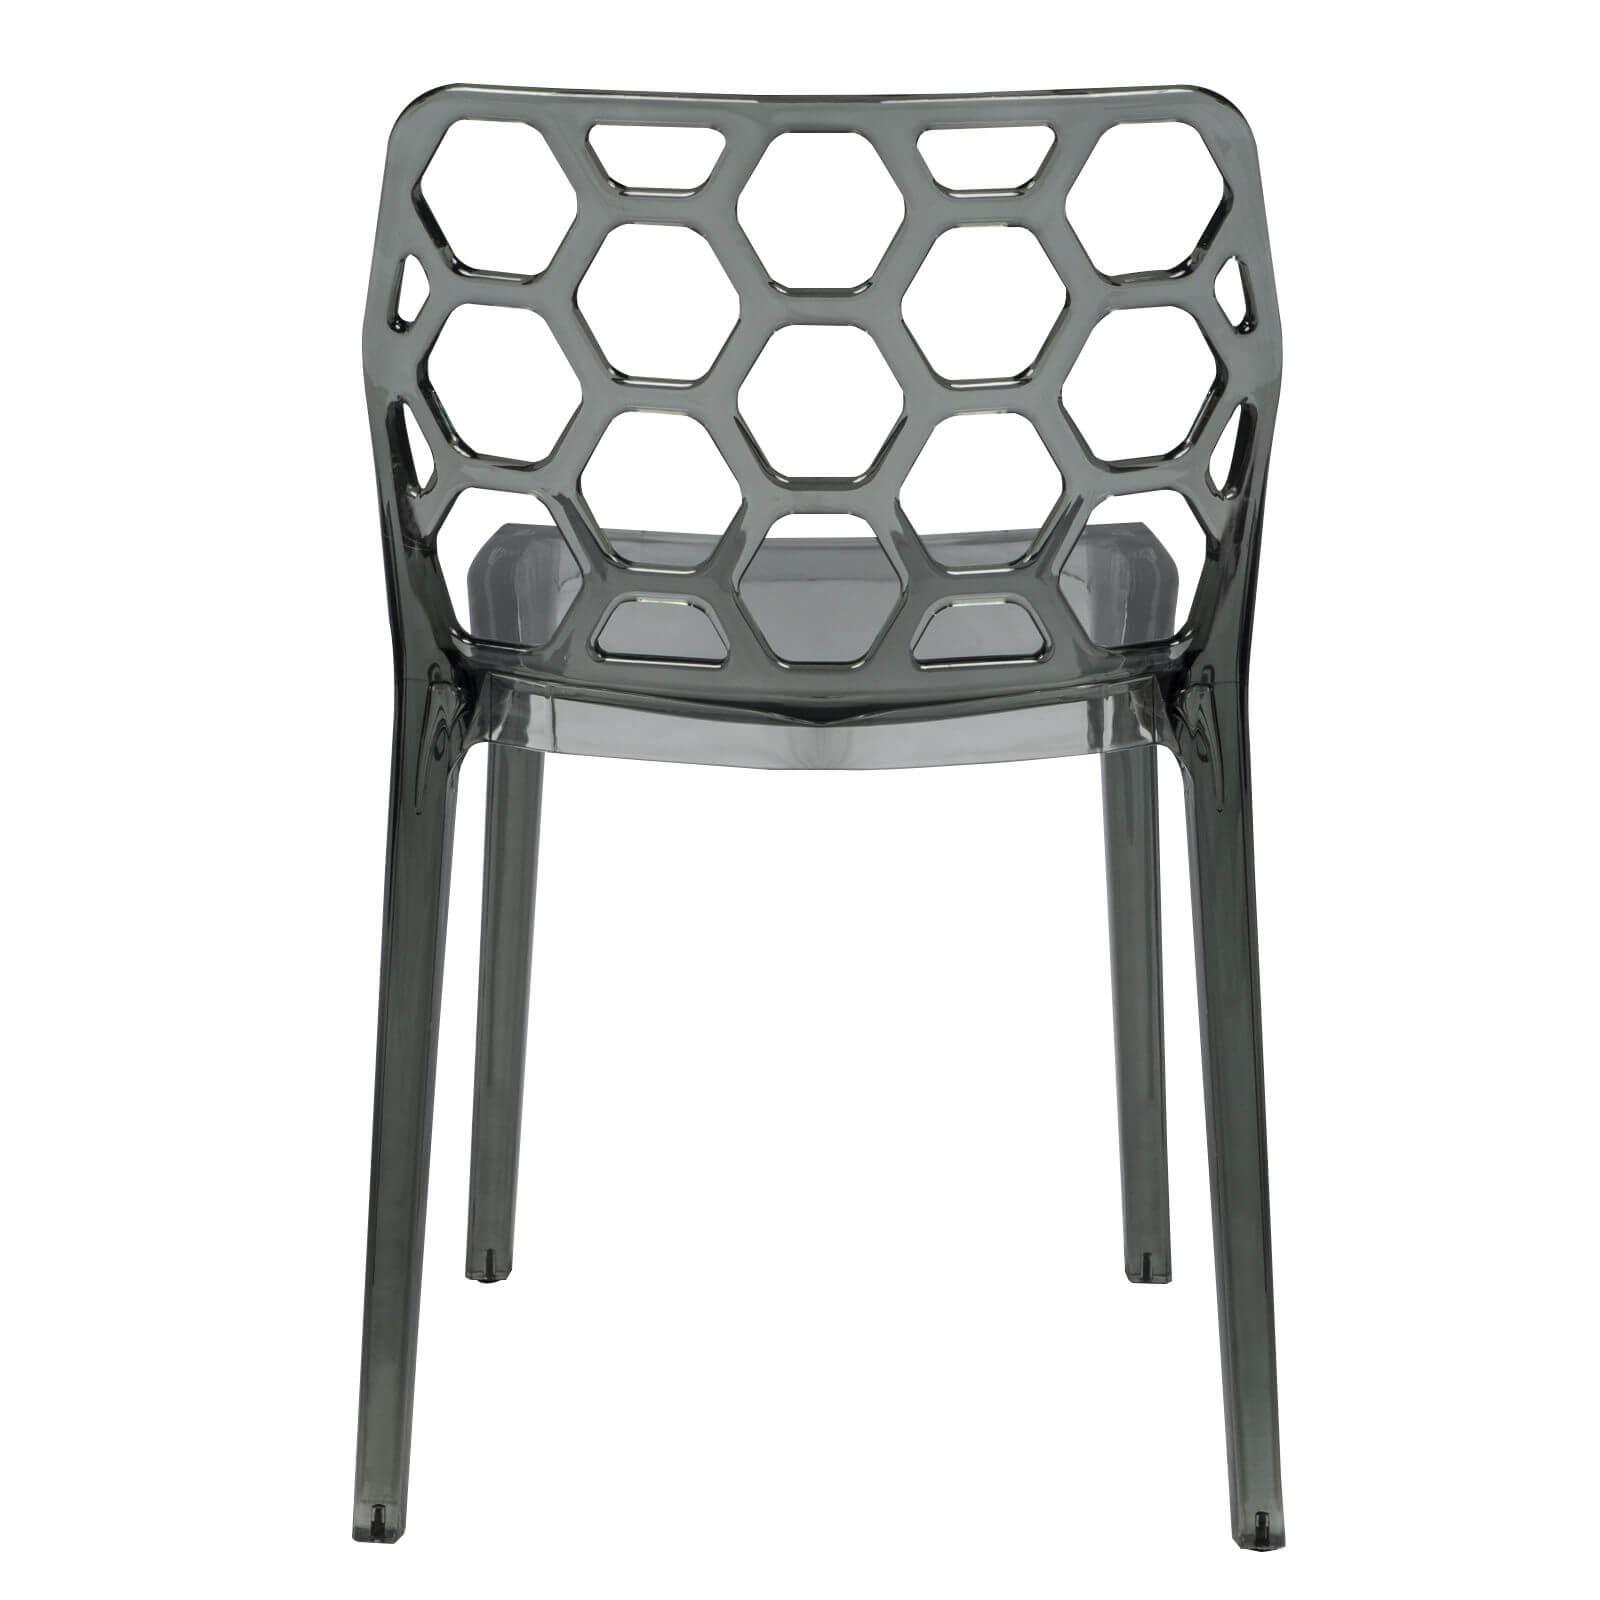 Geometric chair black transparent